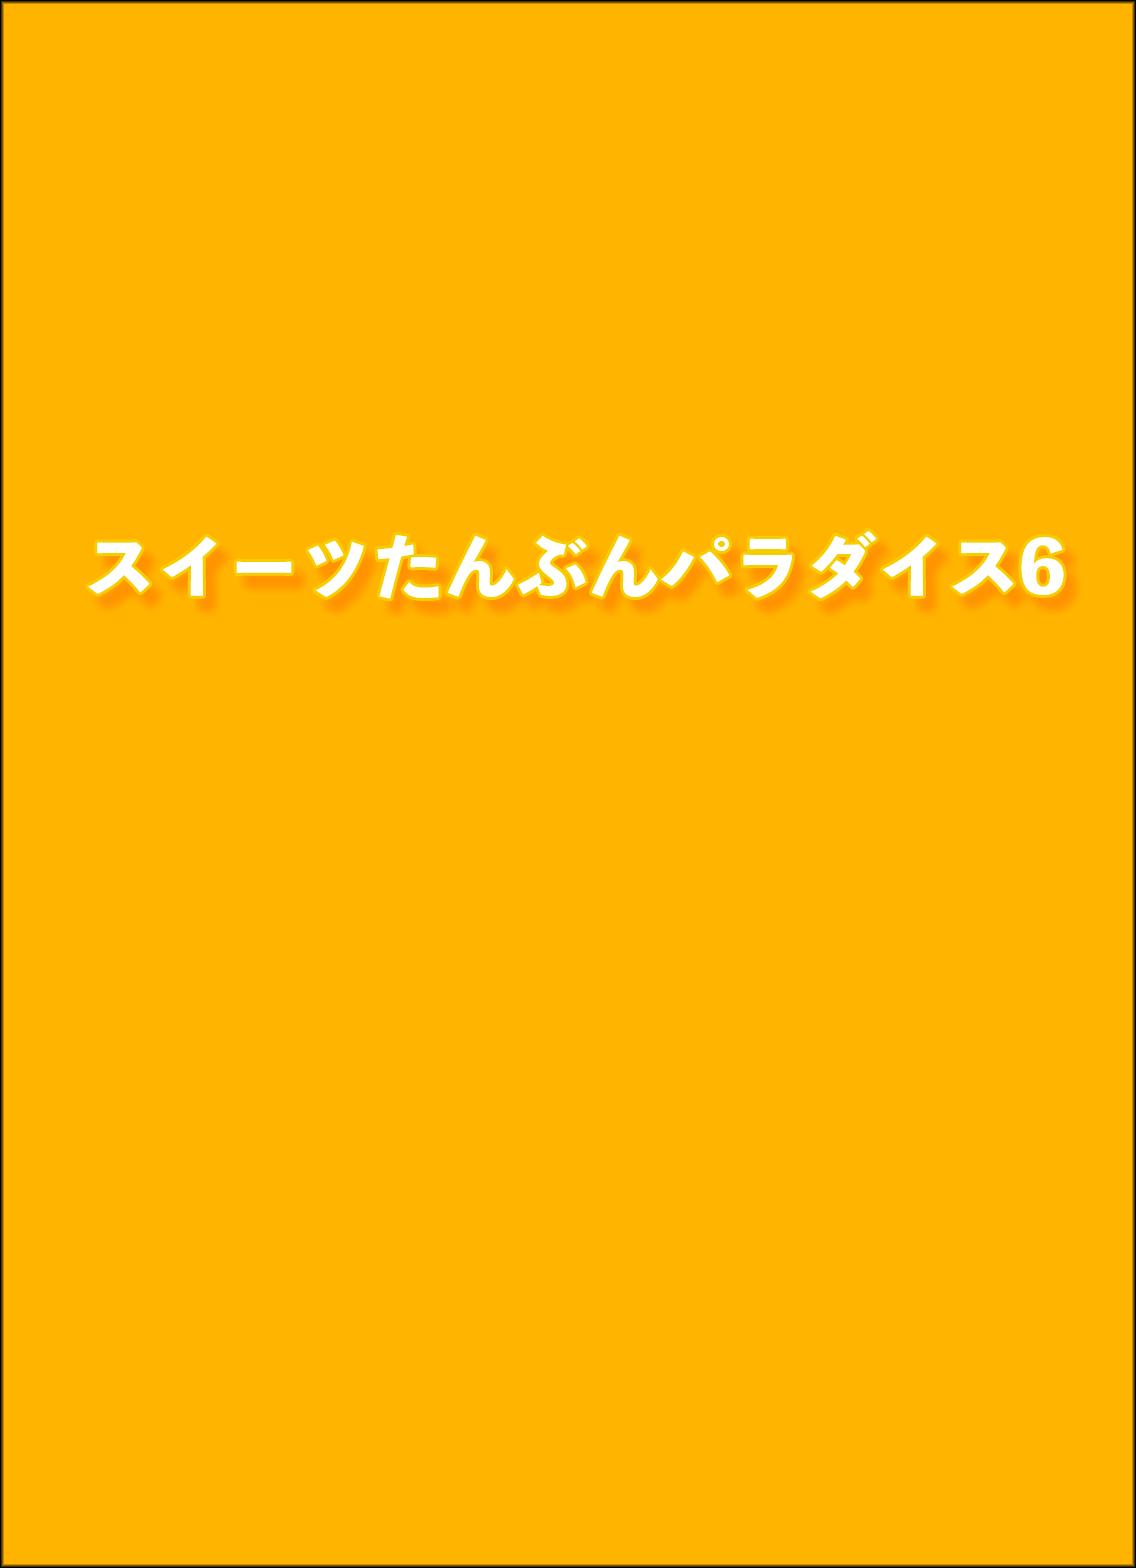 C31741322